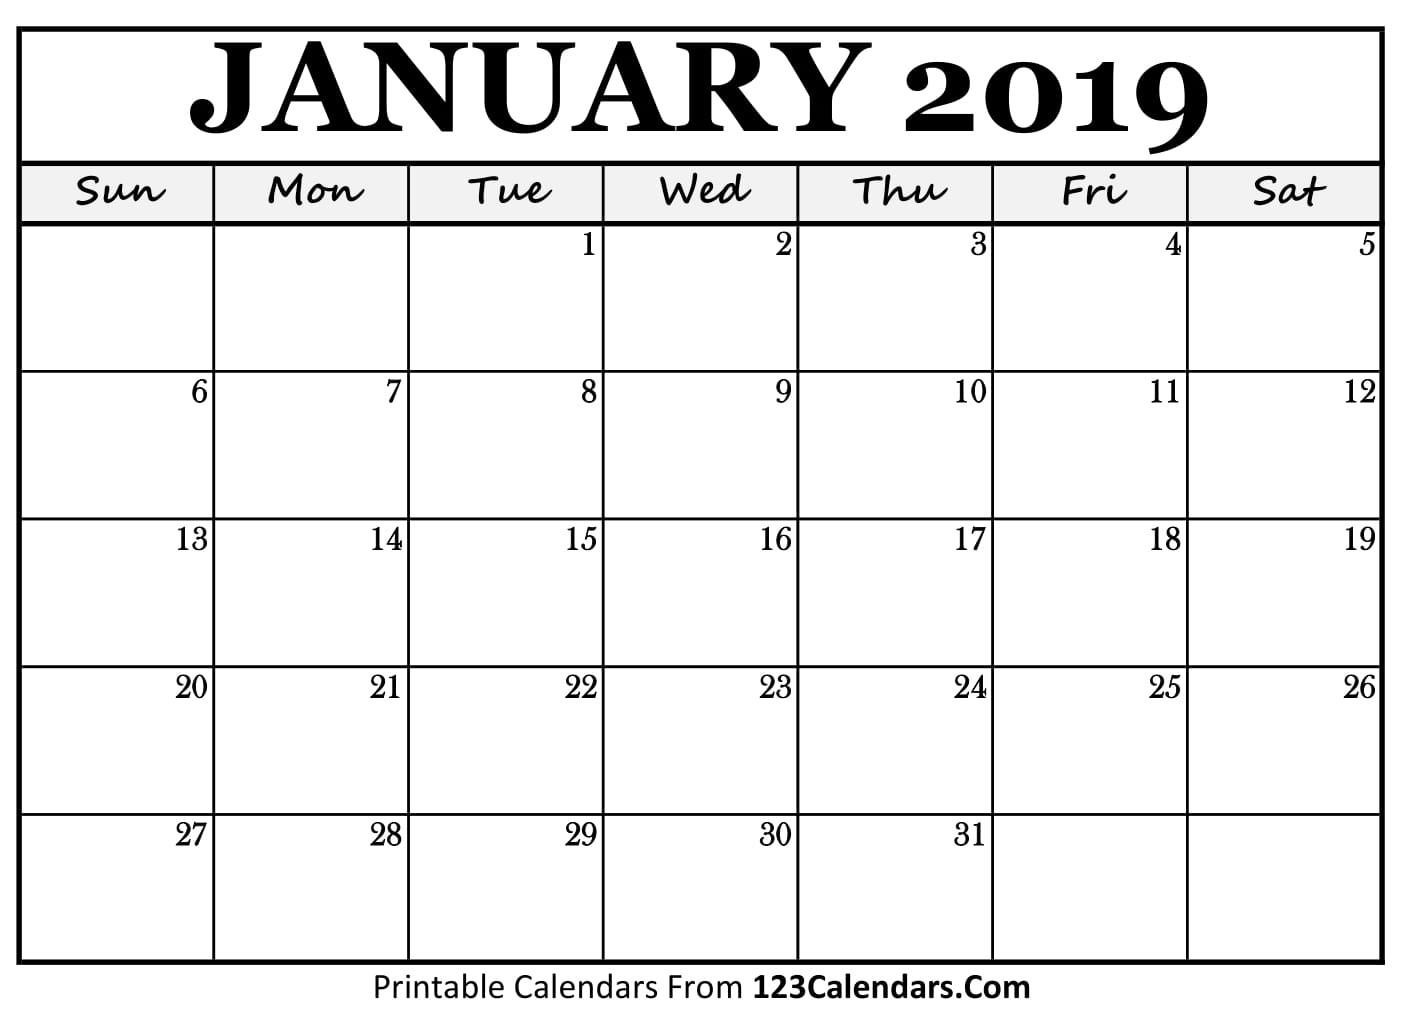 Free Printable Calendar   123Calendars-Free Fillable 2020 Calendar Template